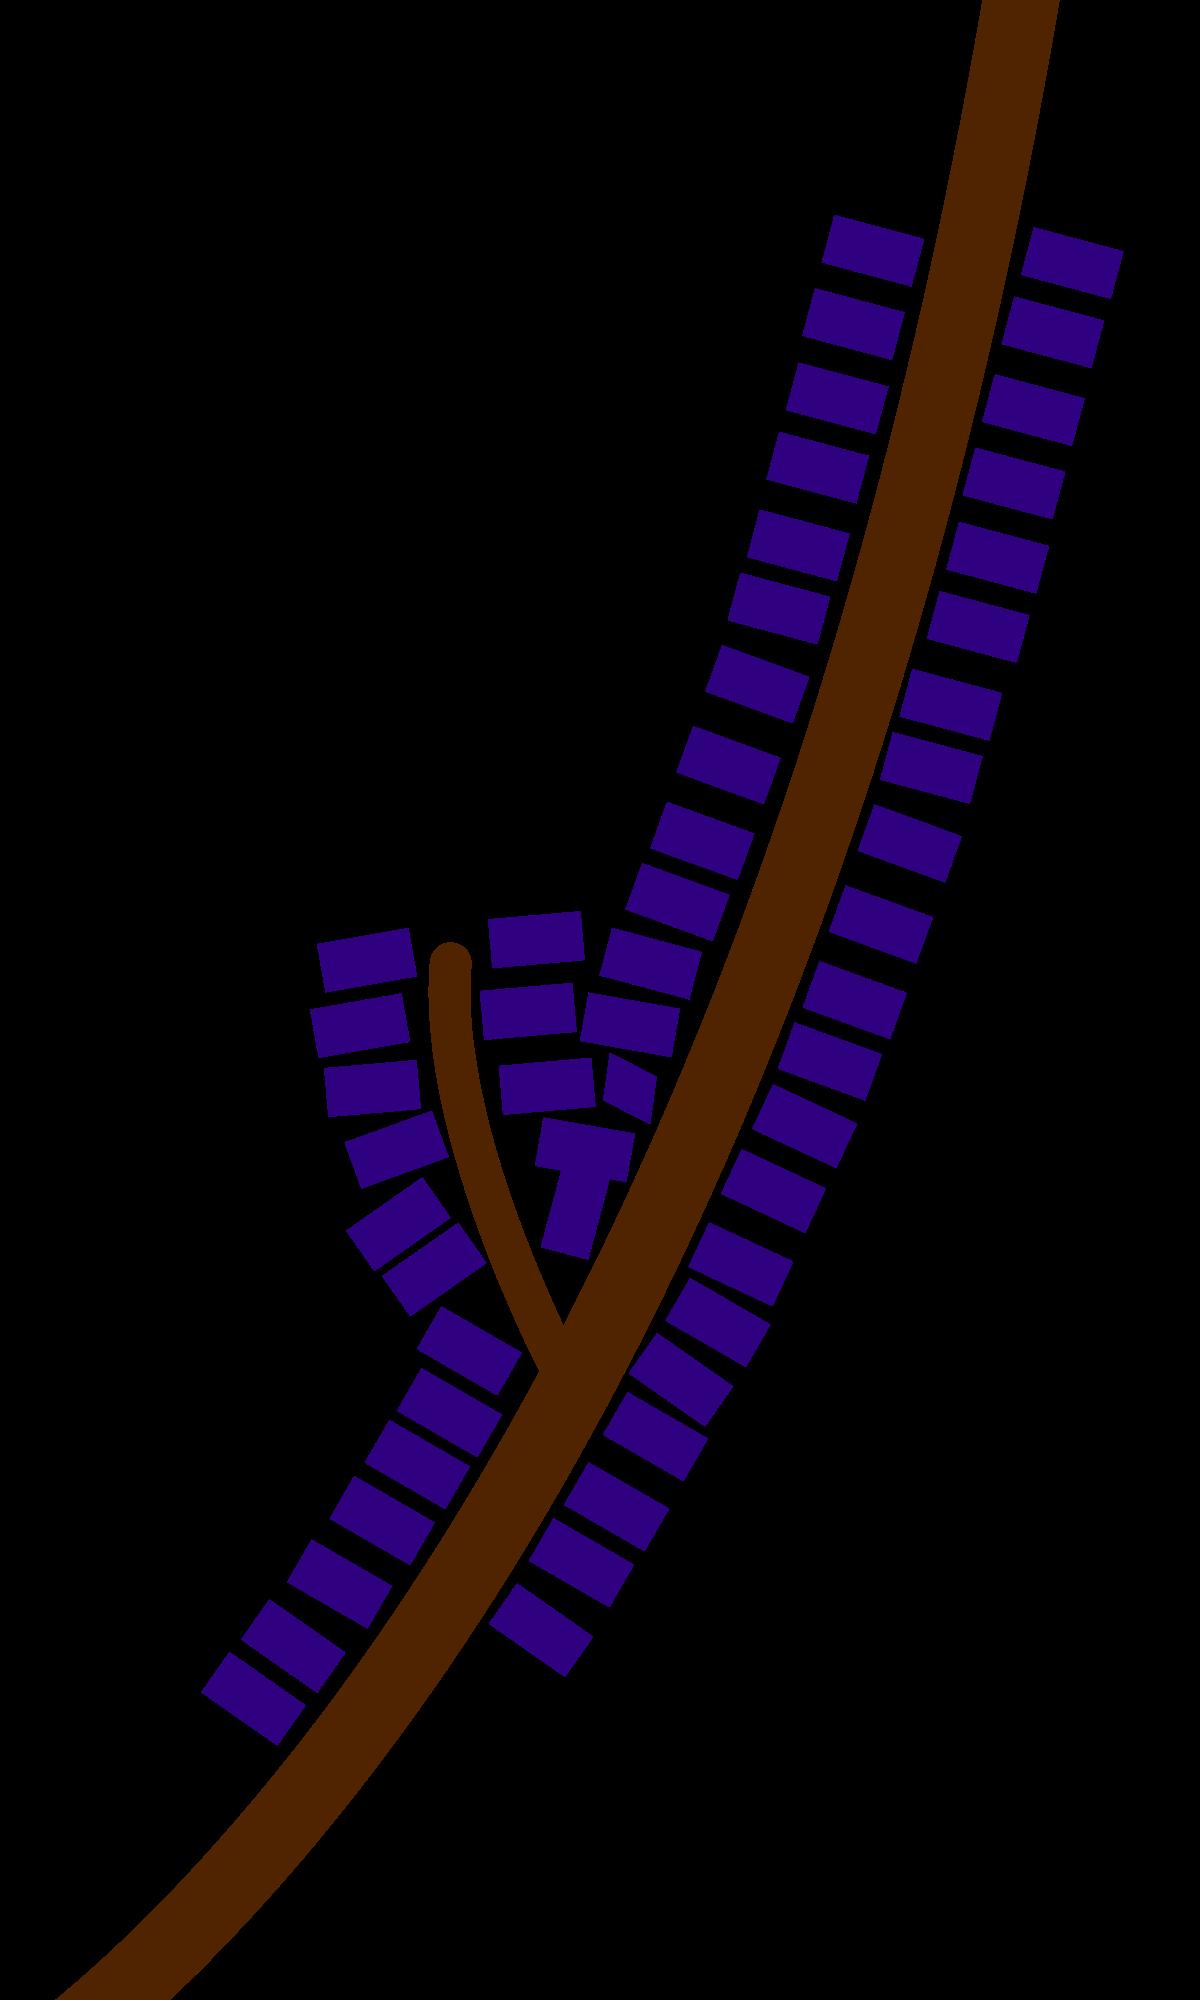 Ribbon development - Wikipedia